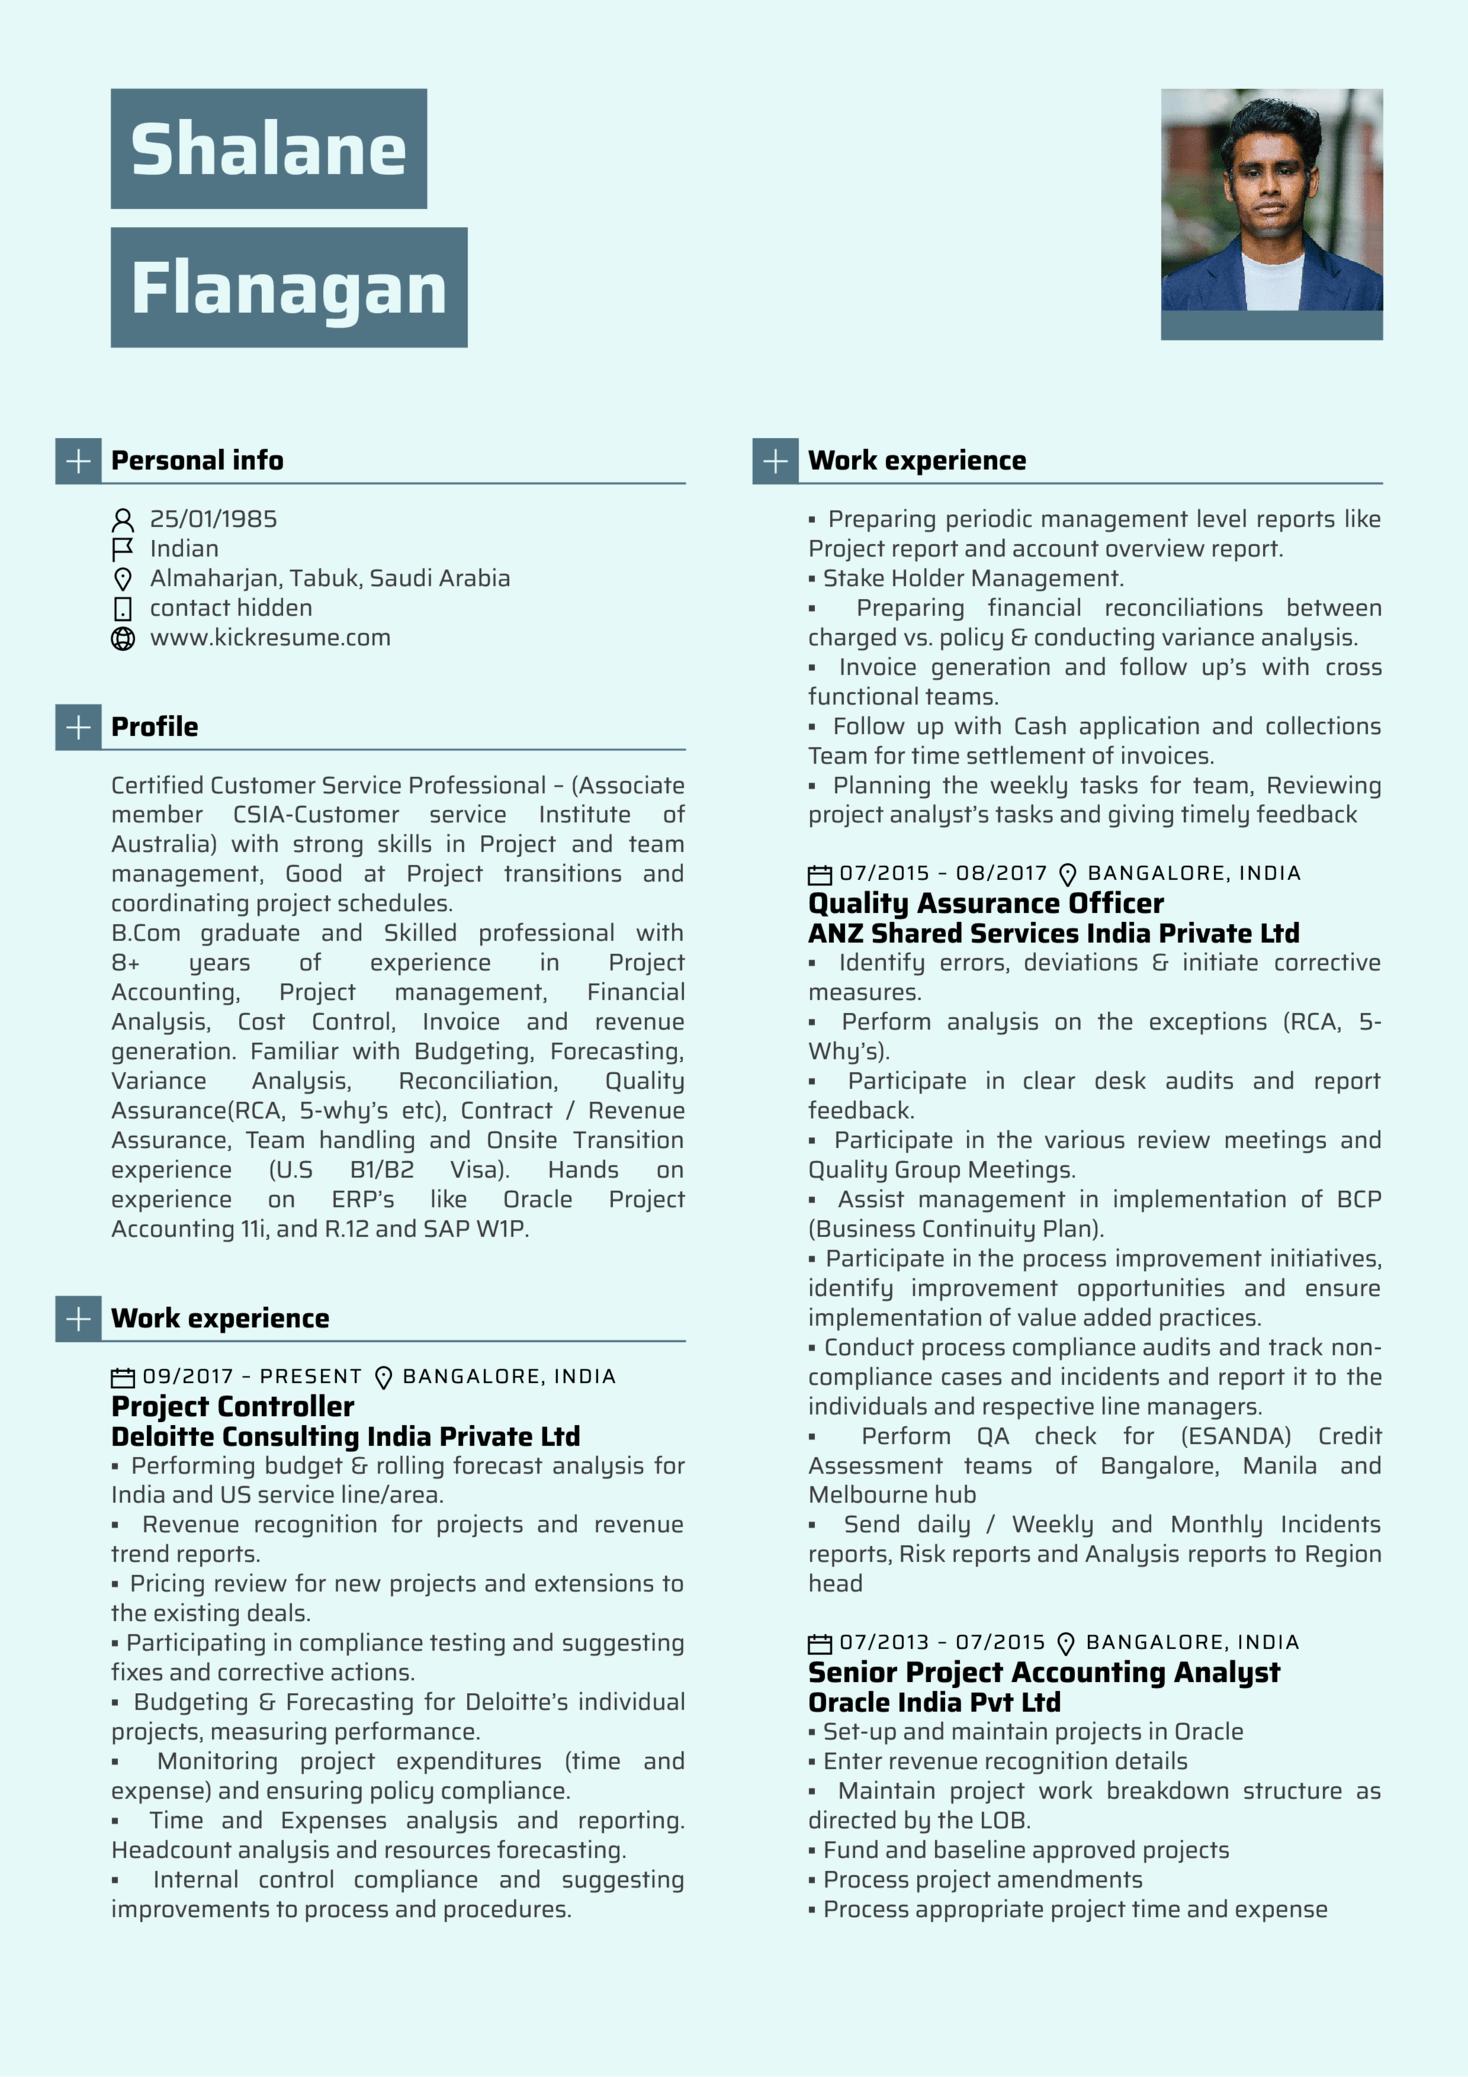 Deloitte Finance Manager Resume Template (Part 1)